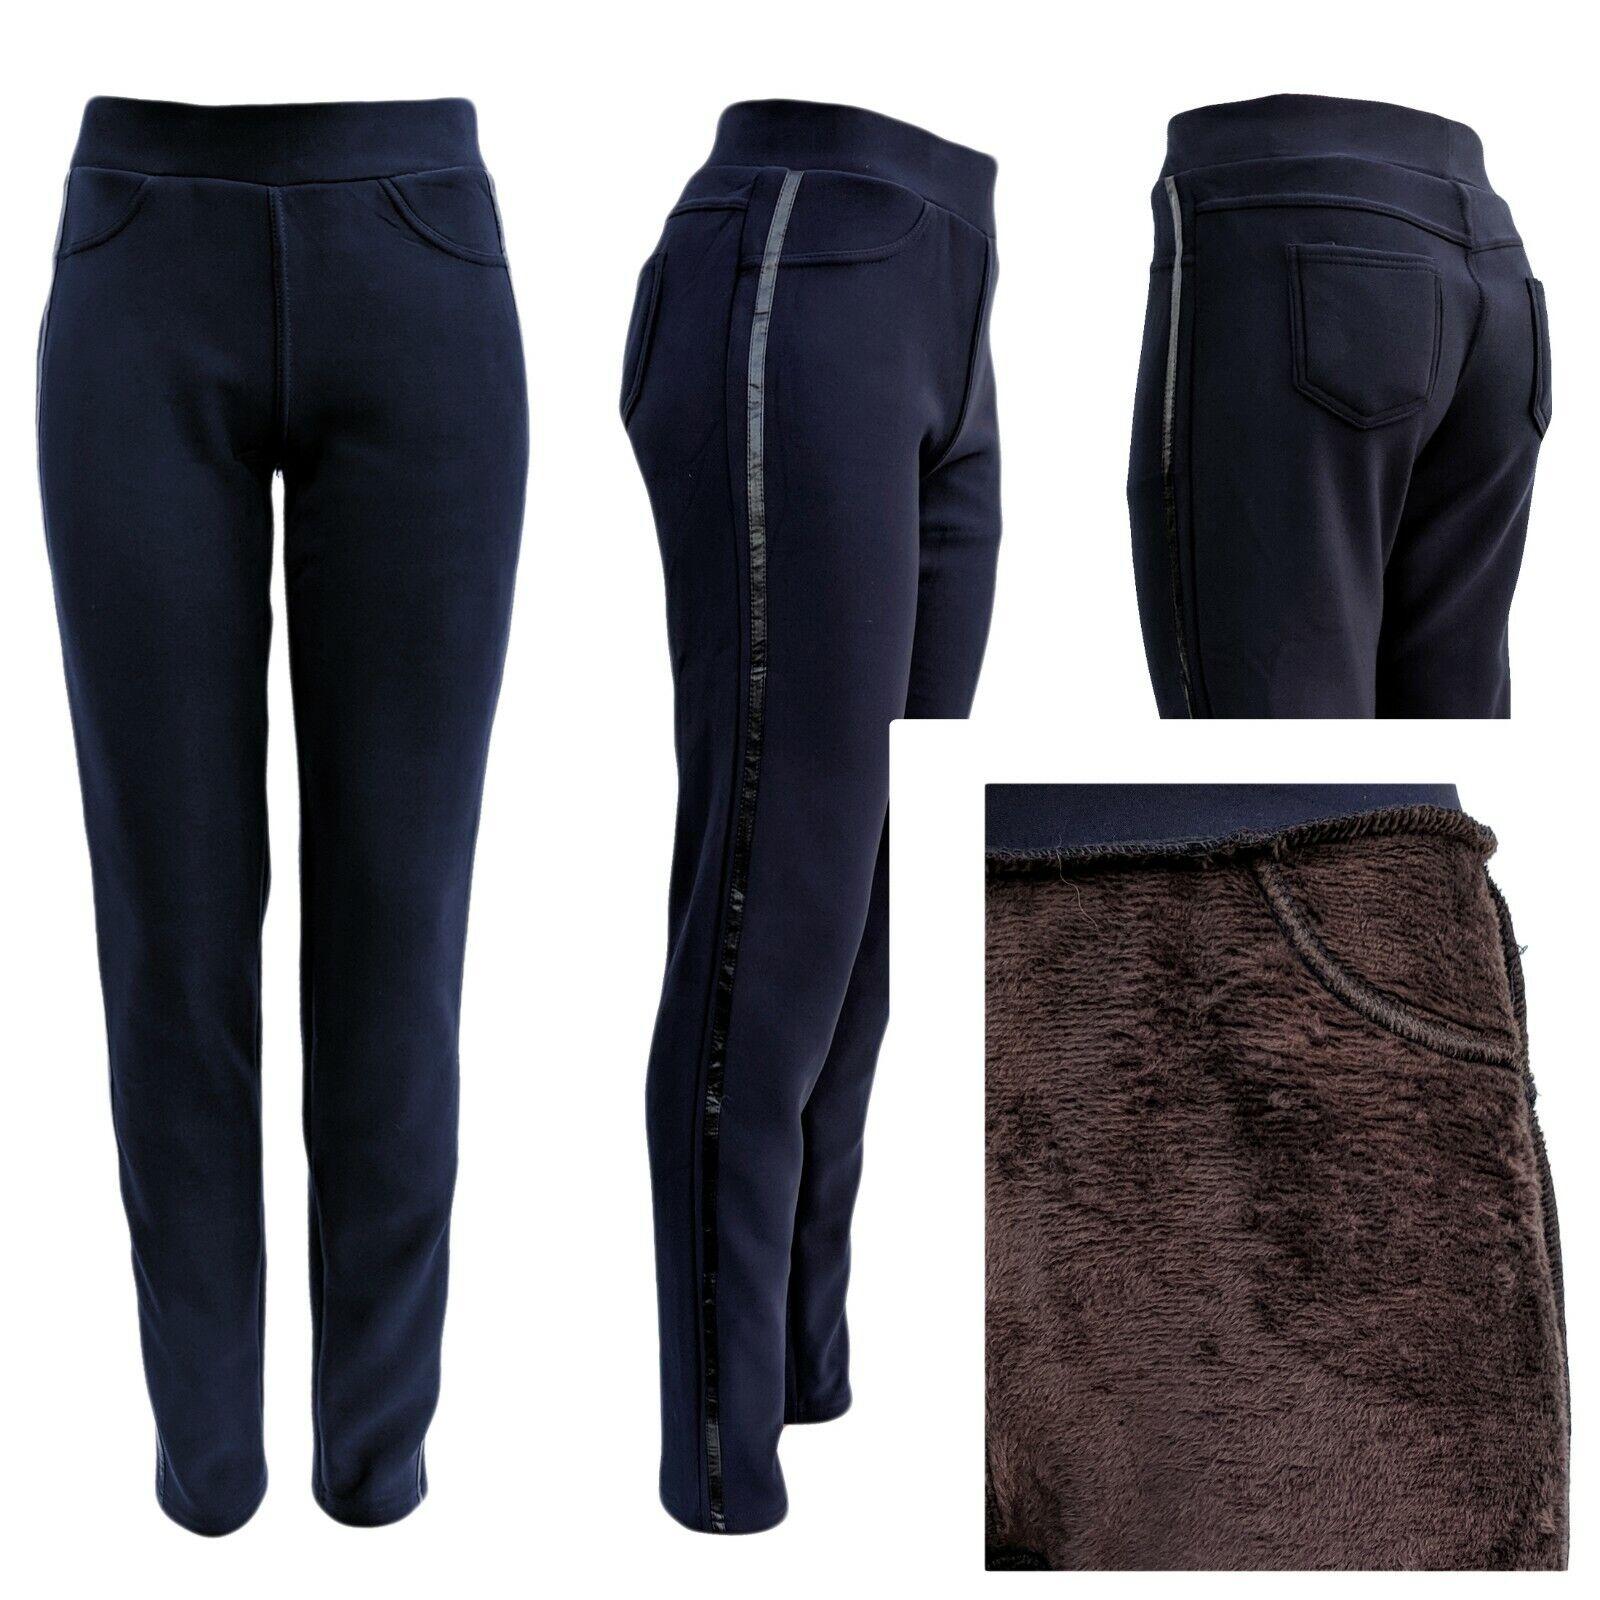 Winterhose Damen Thermofutter - Sweatpants - dicke Jogginghose Trackpants 34-40